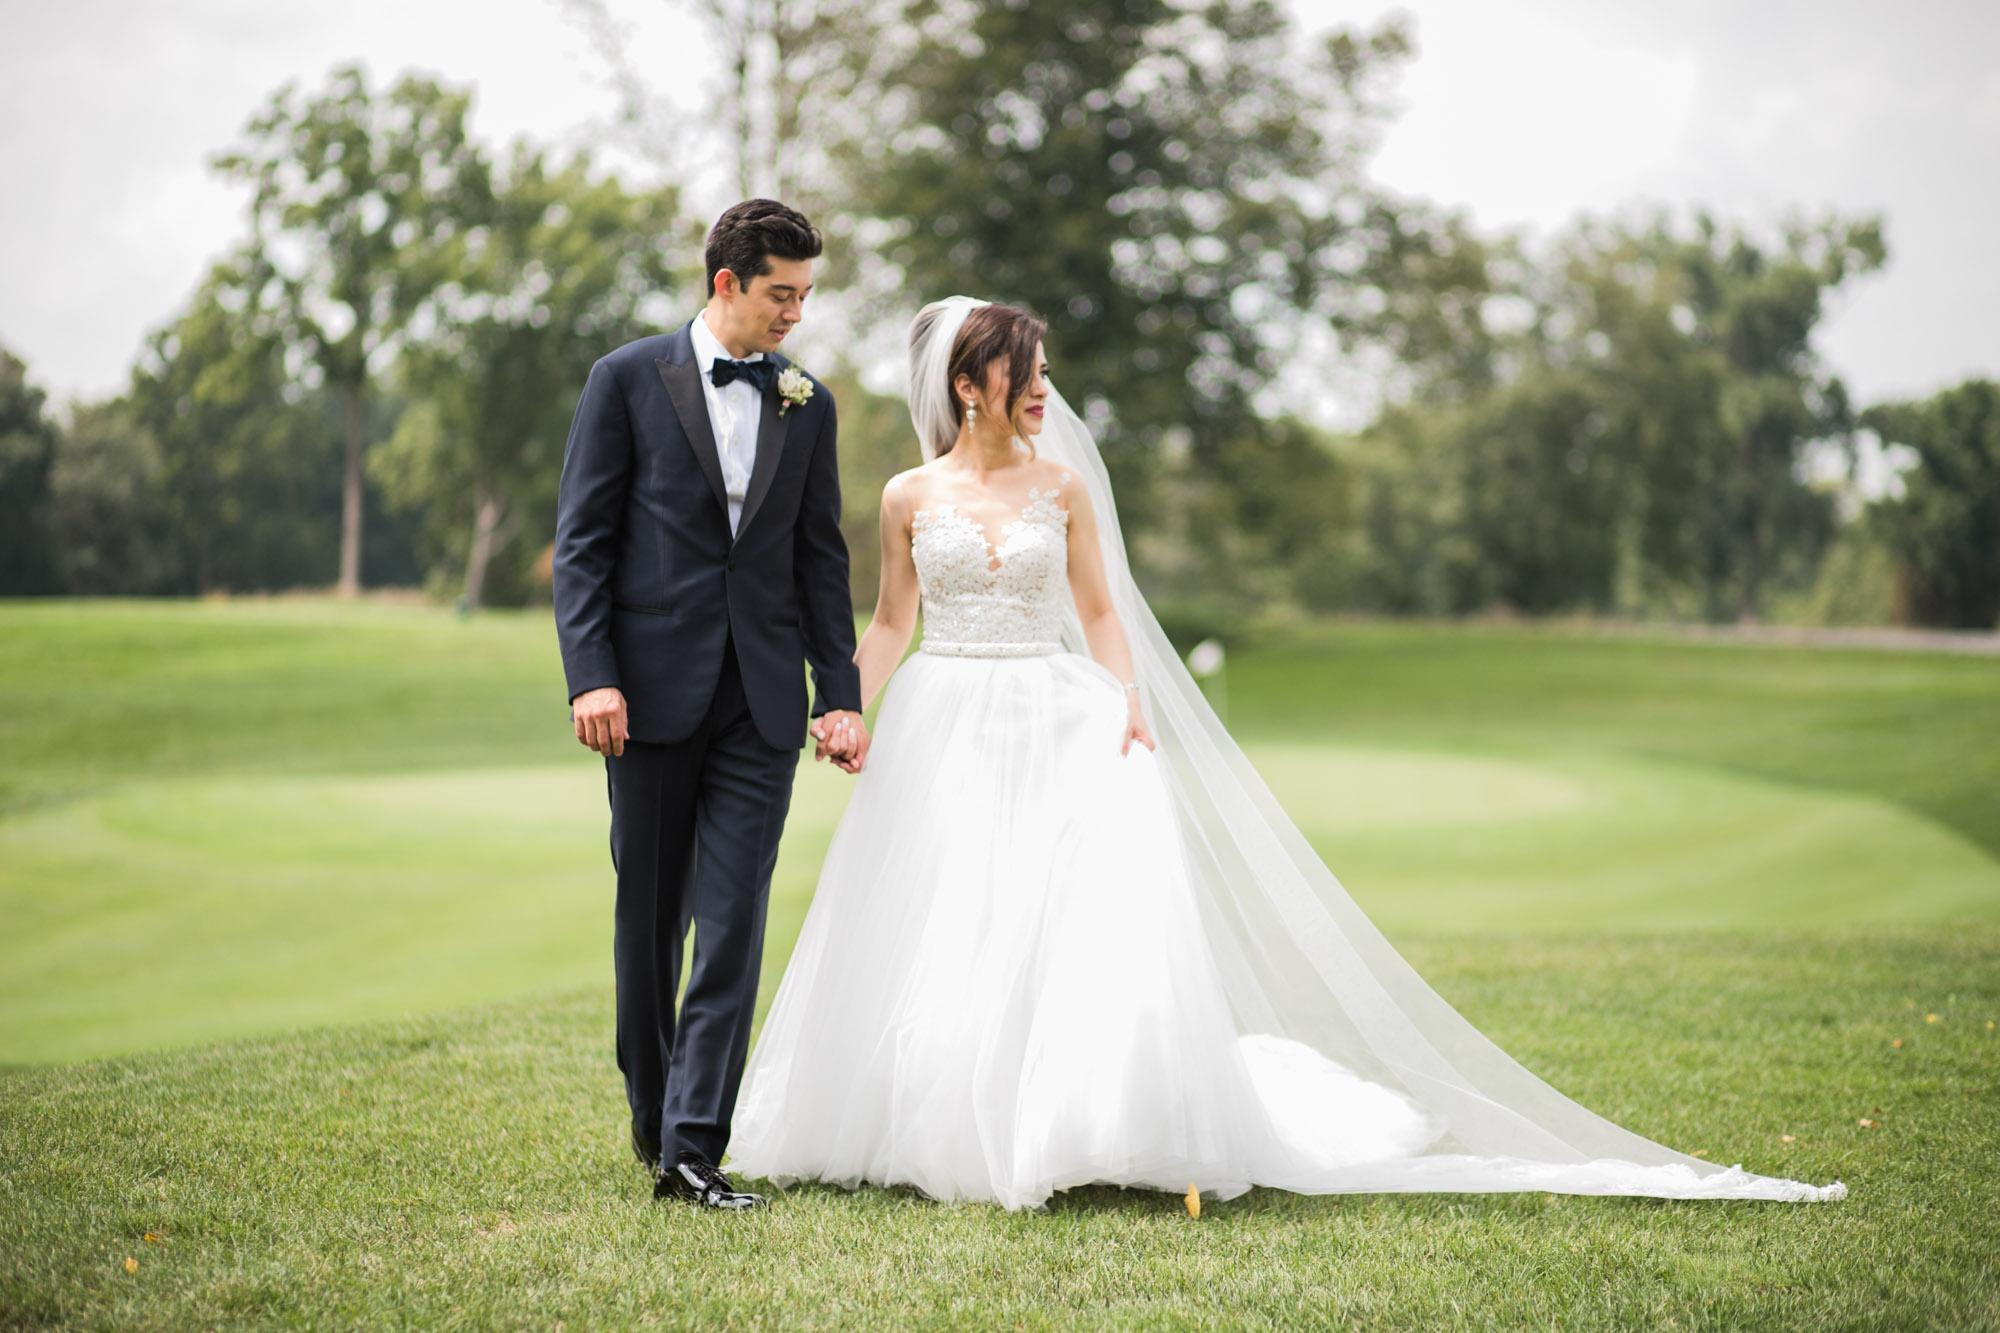 sylvania-country-club-wedding-photos-53.jpg